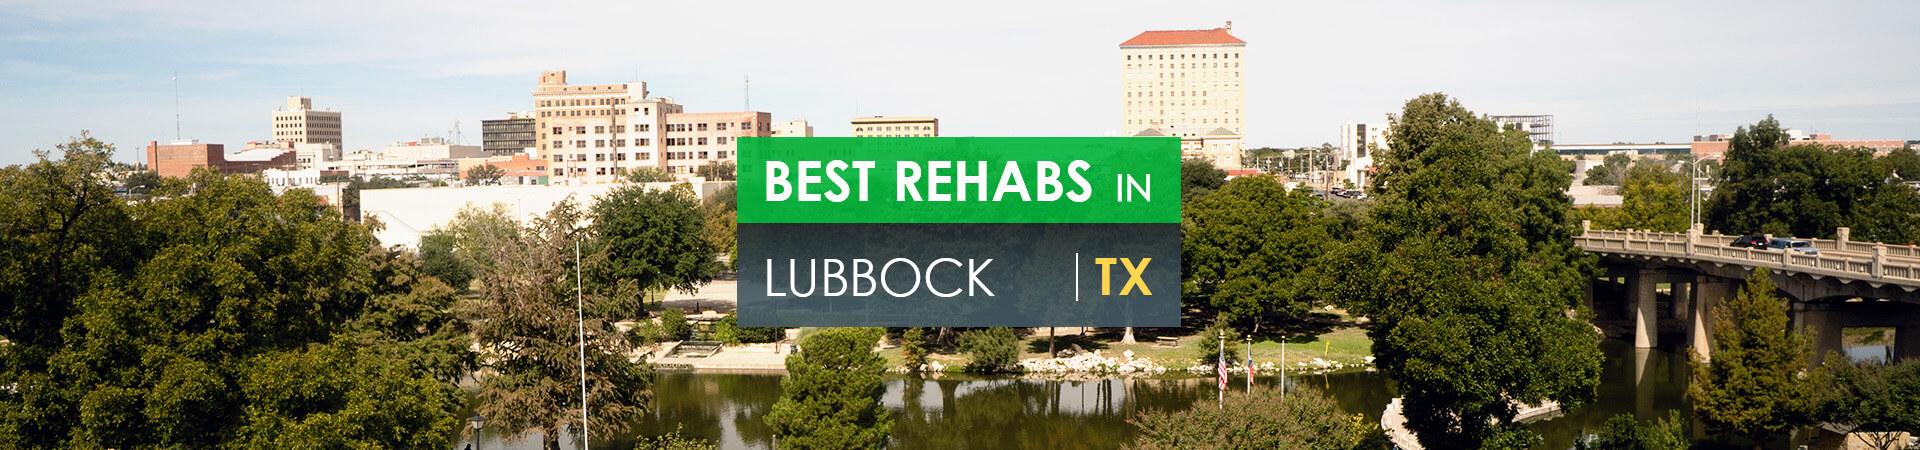 Best rehabs in Lubbock, TX